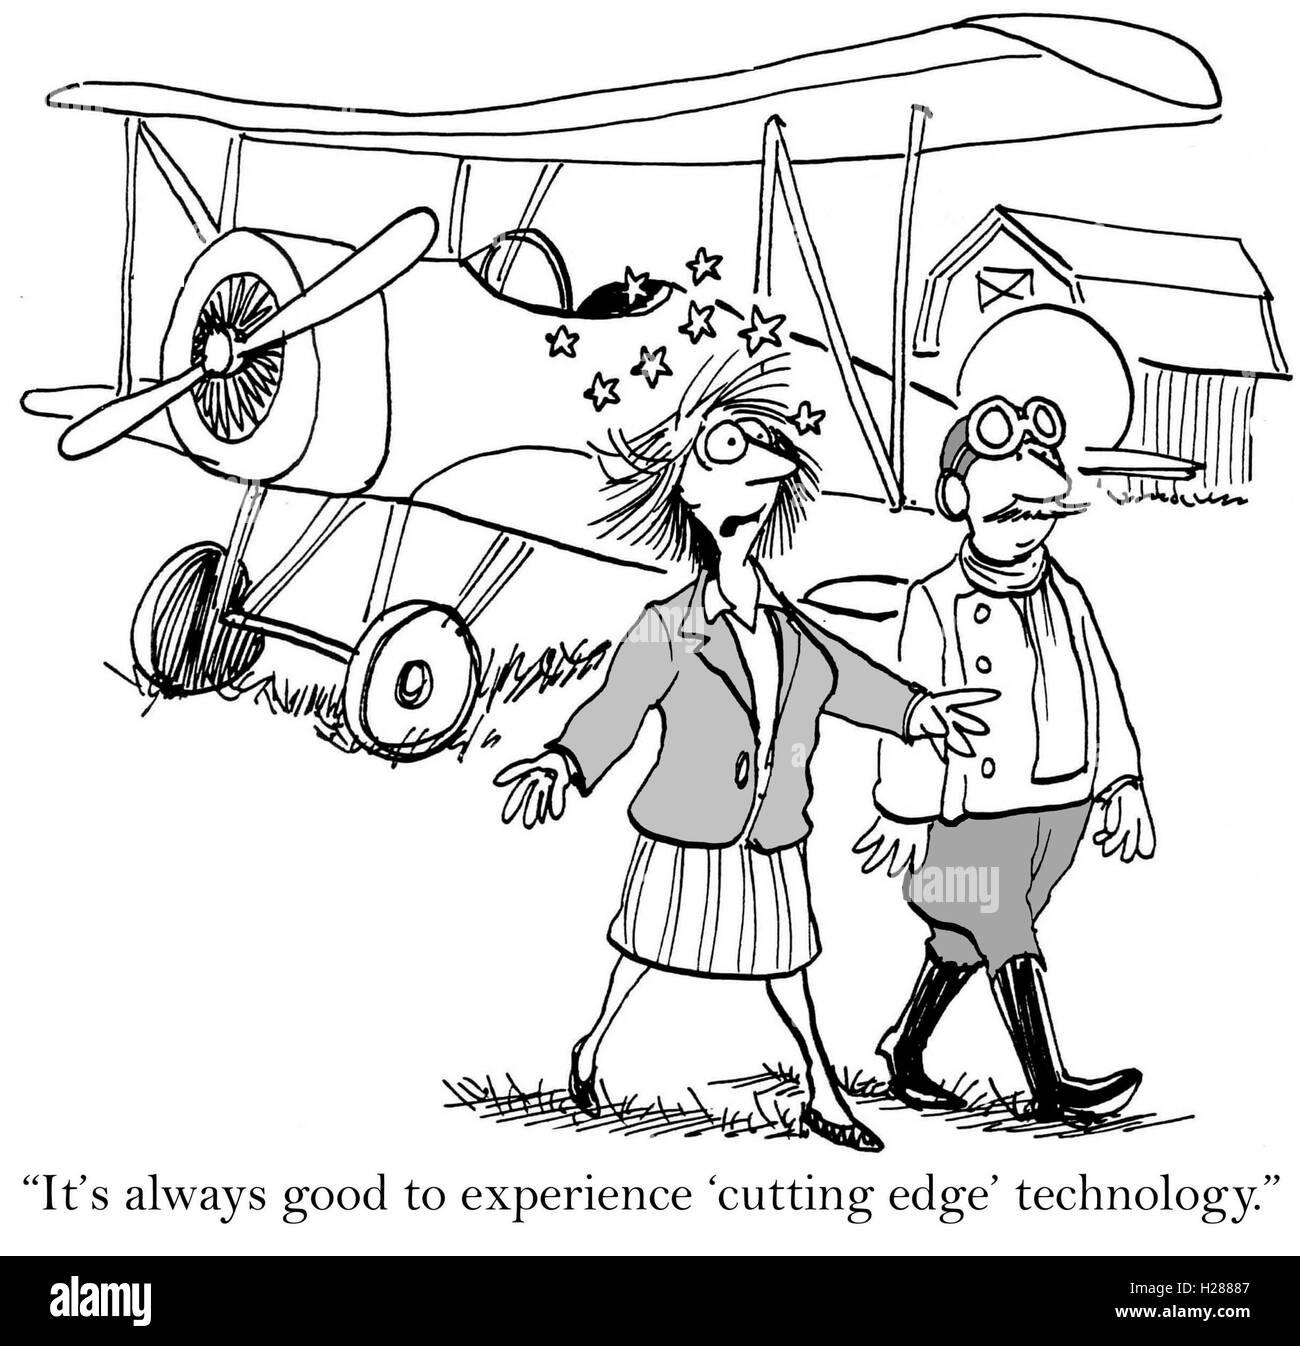 Cutting Edge Technology - Stock Image